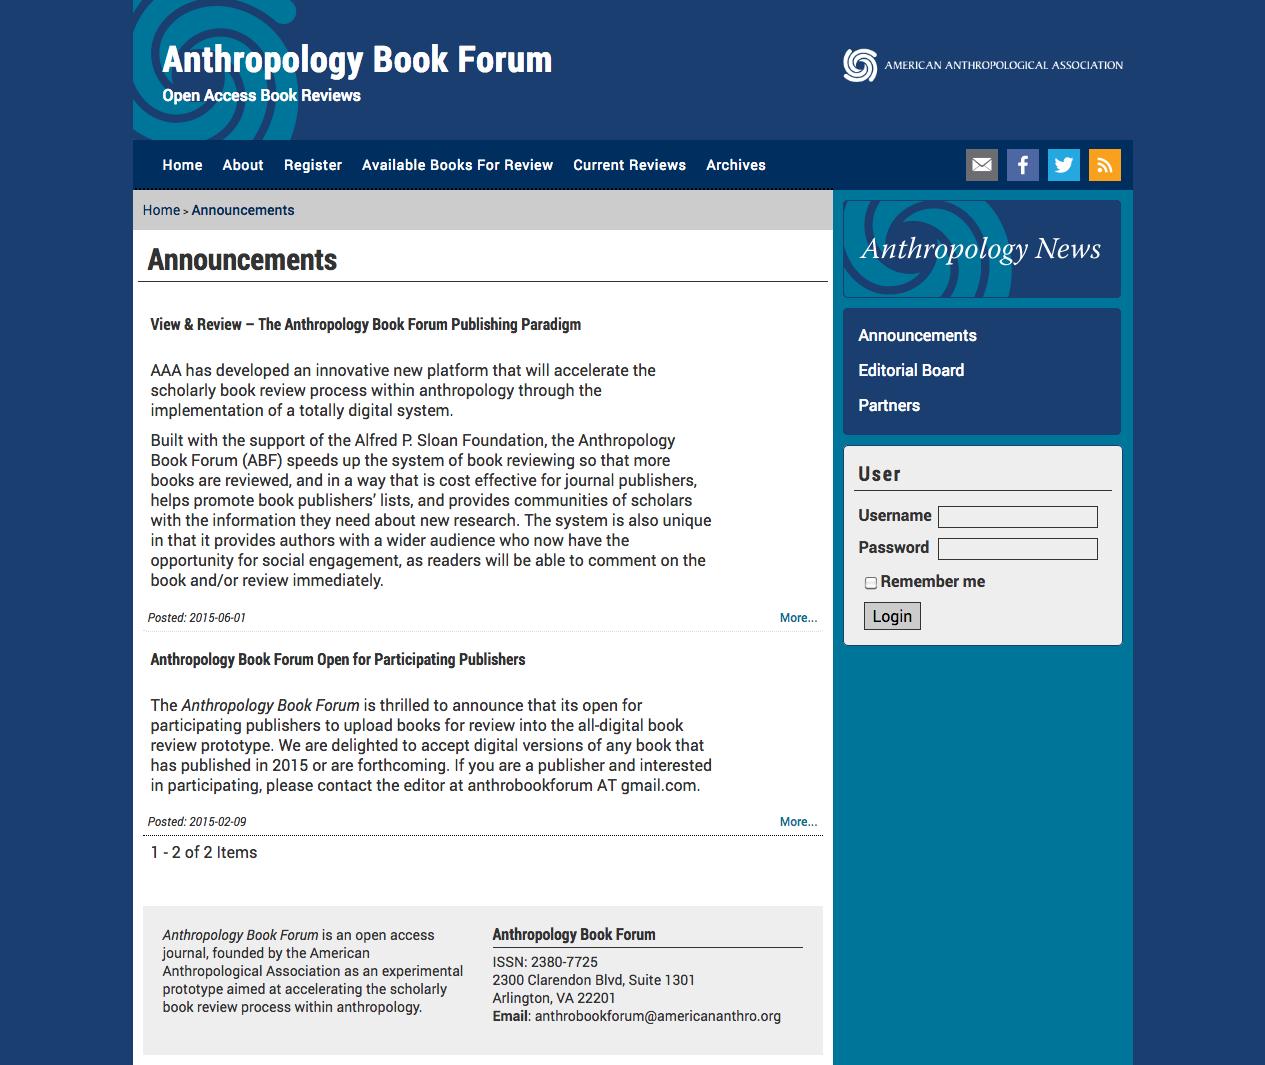 Anthropology Book Forum